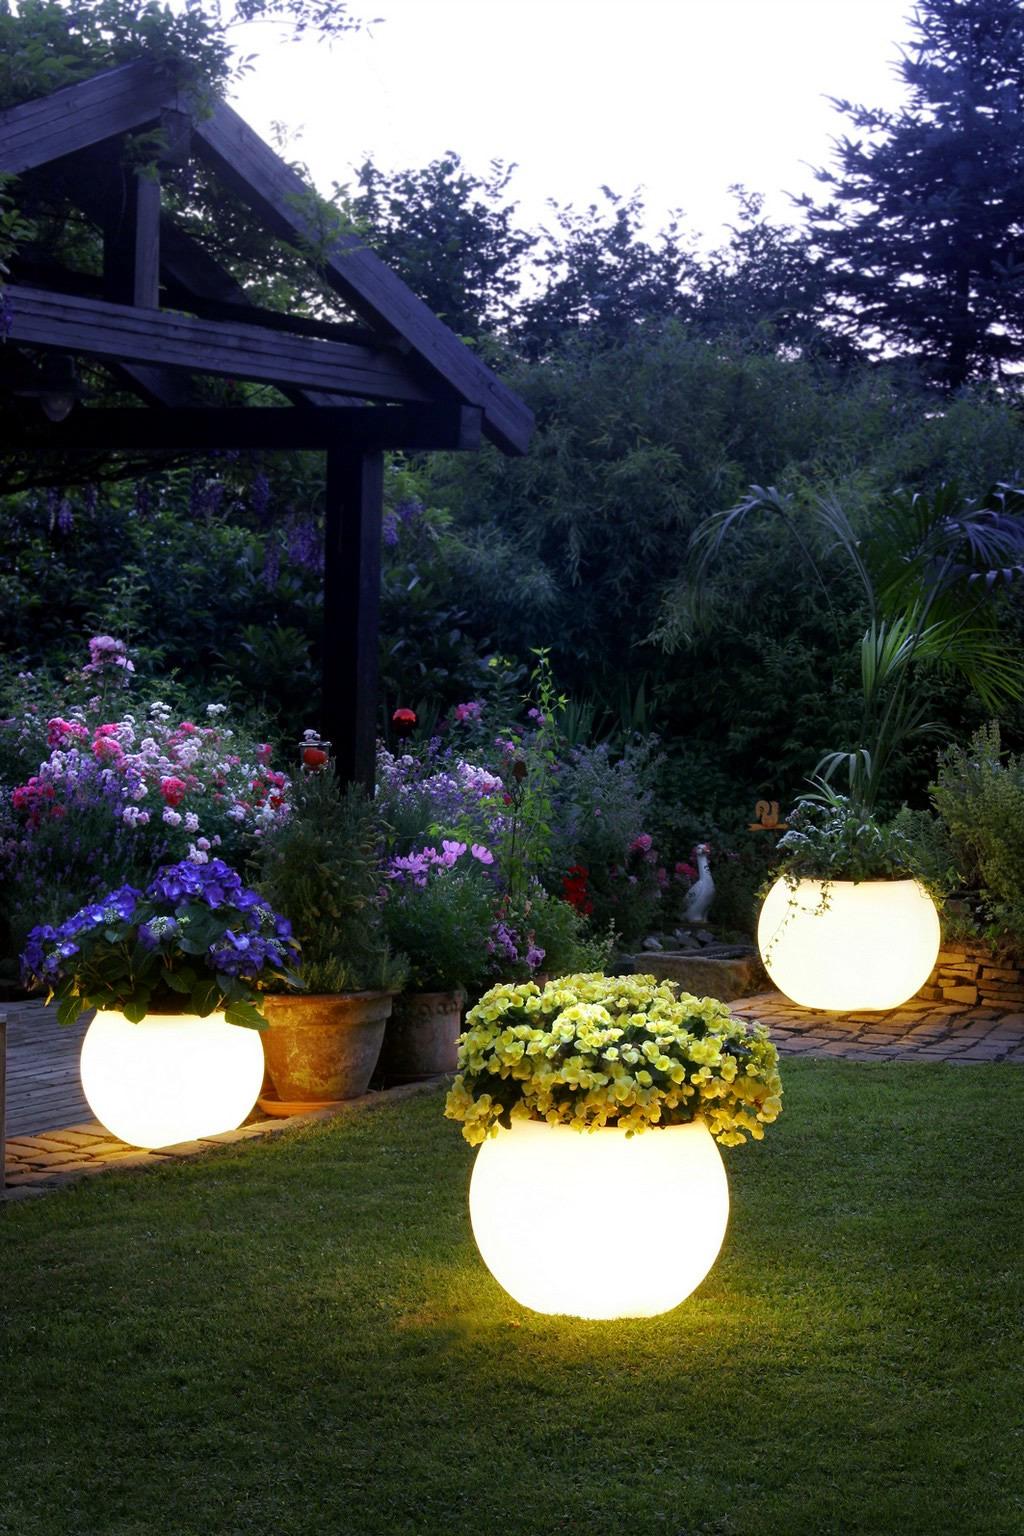 10 creative garden decoration ideas that will delight.